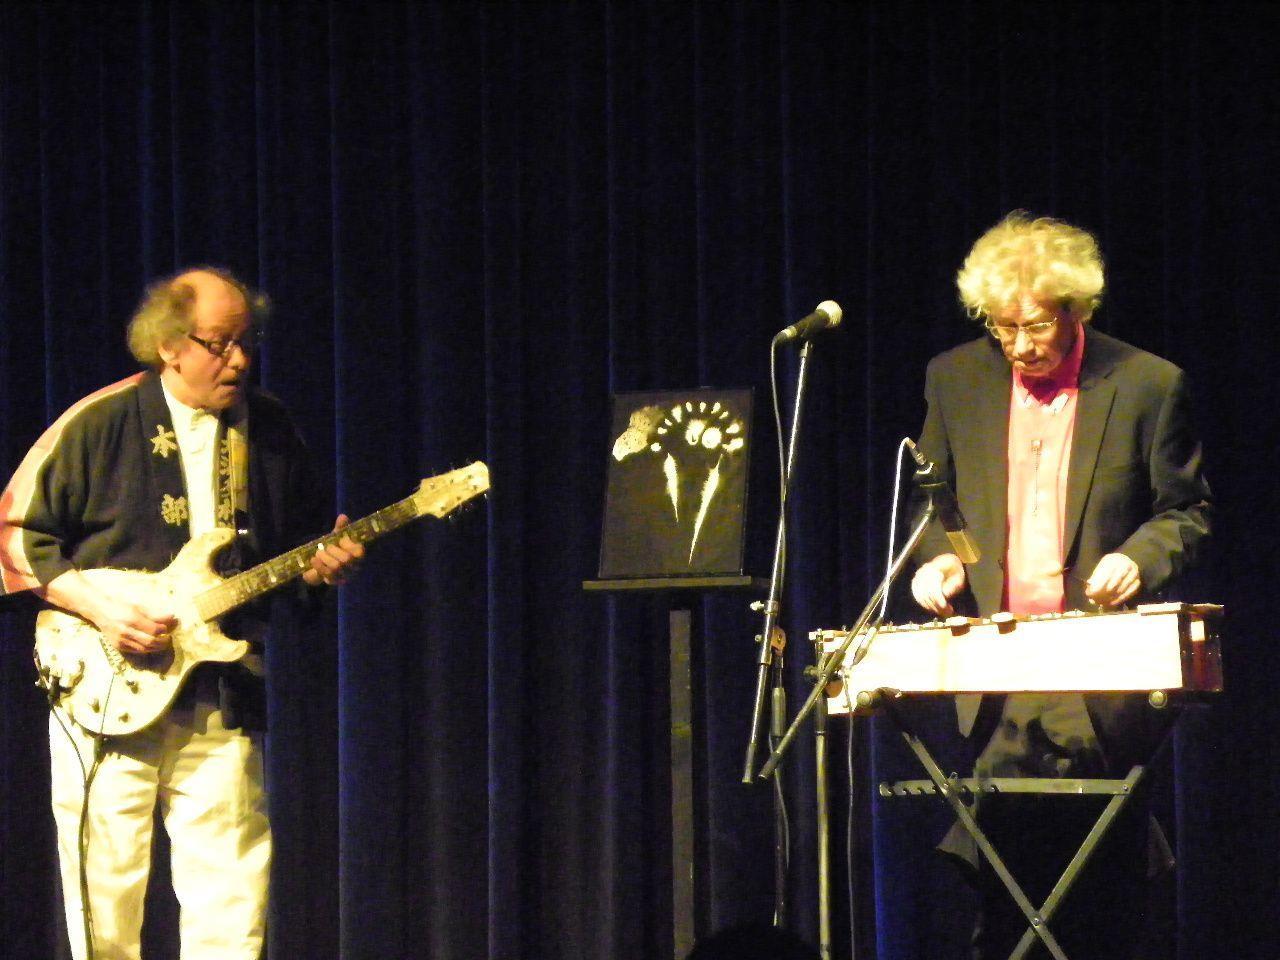 Peter Wilmanns & Buddy Sacher